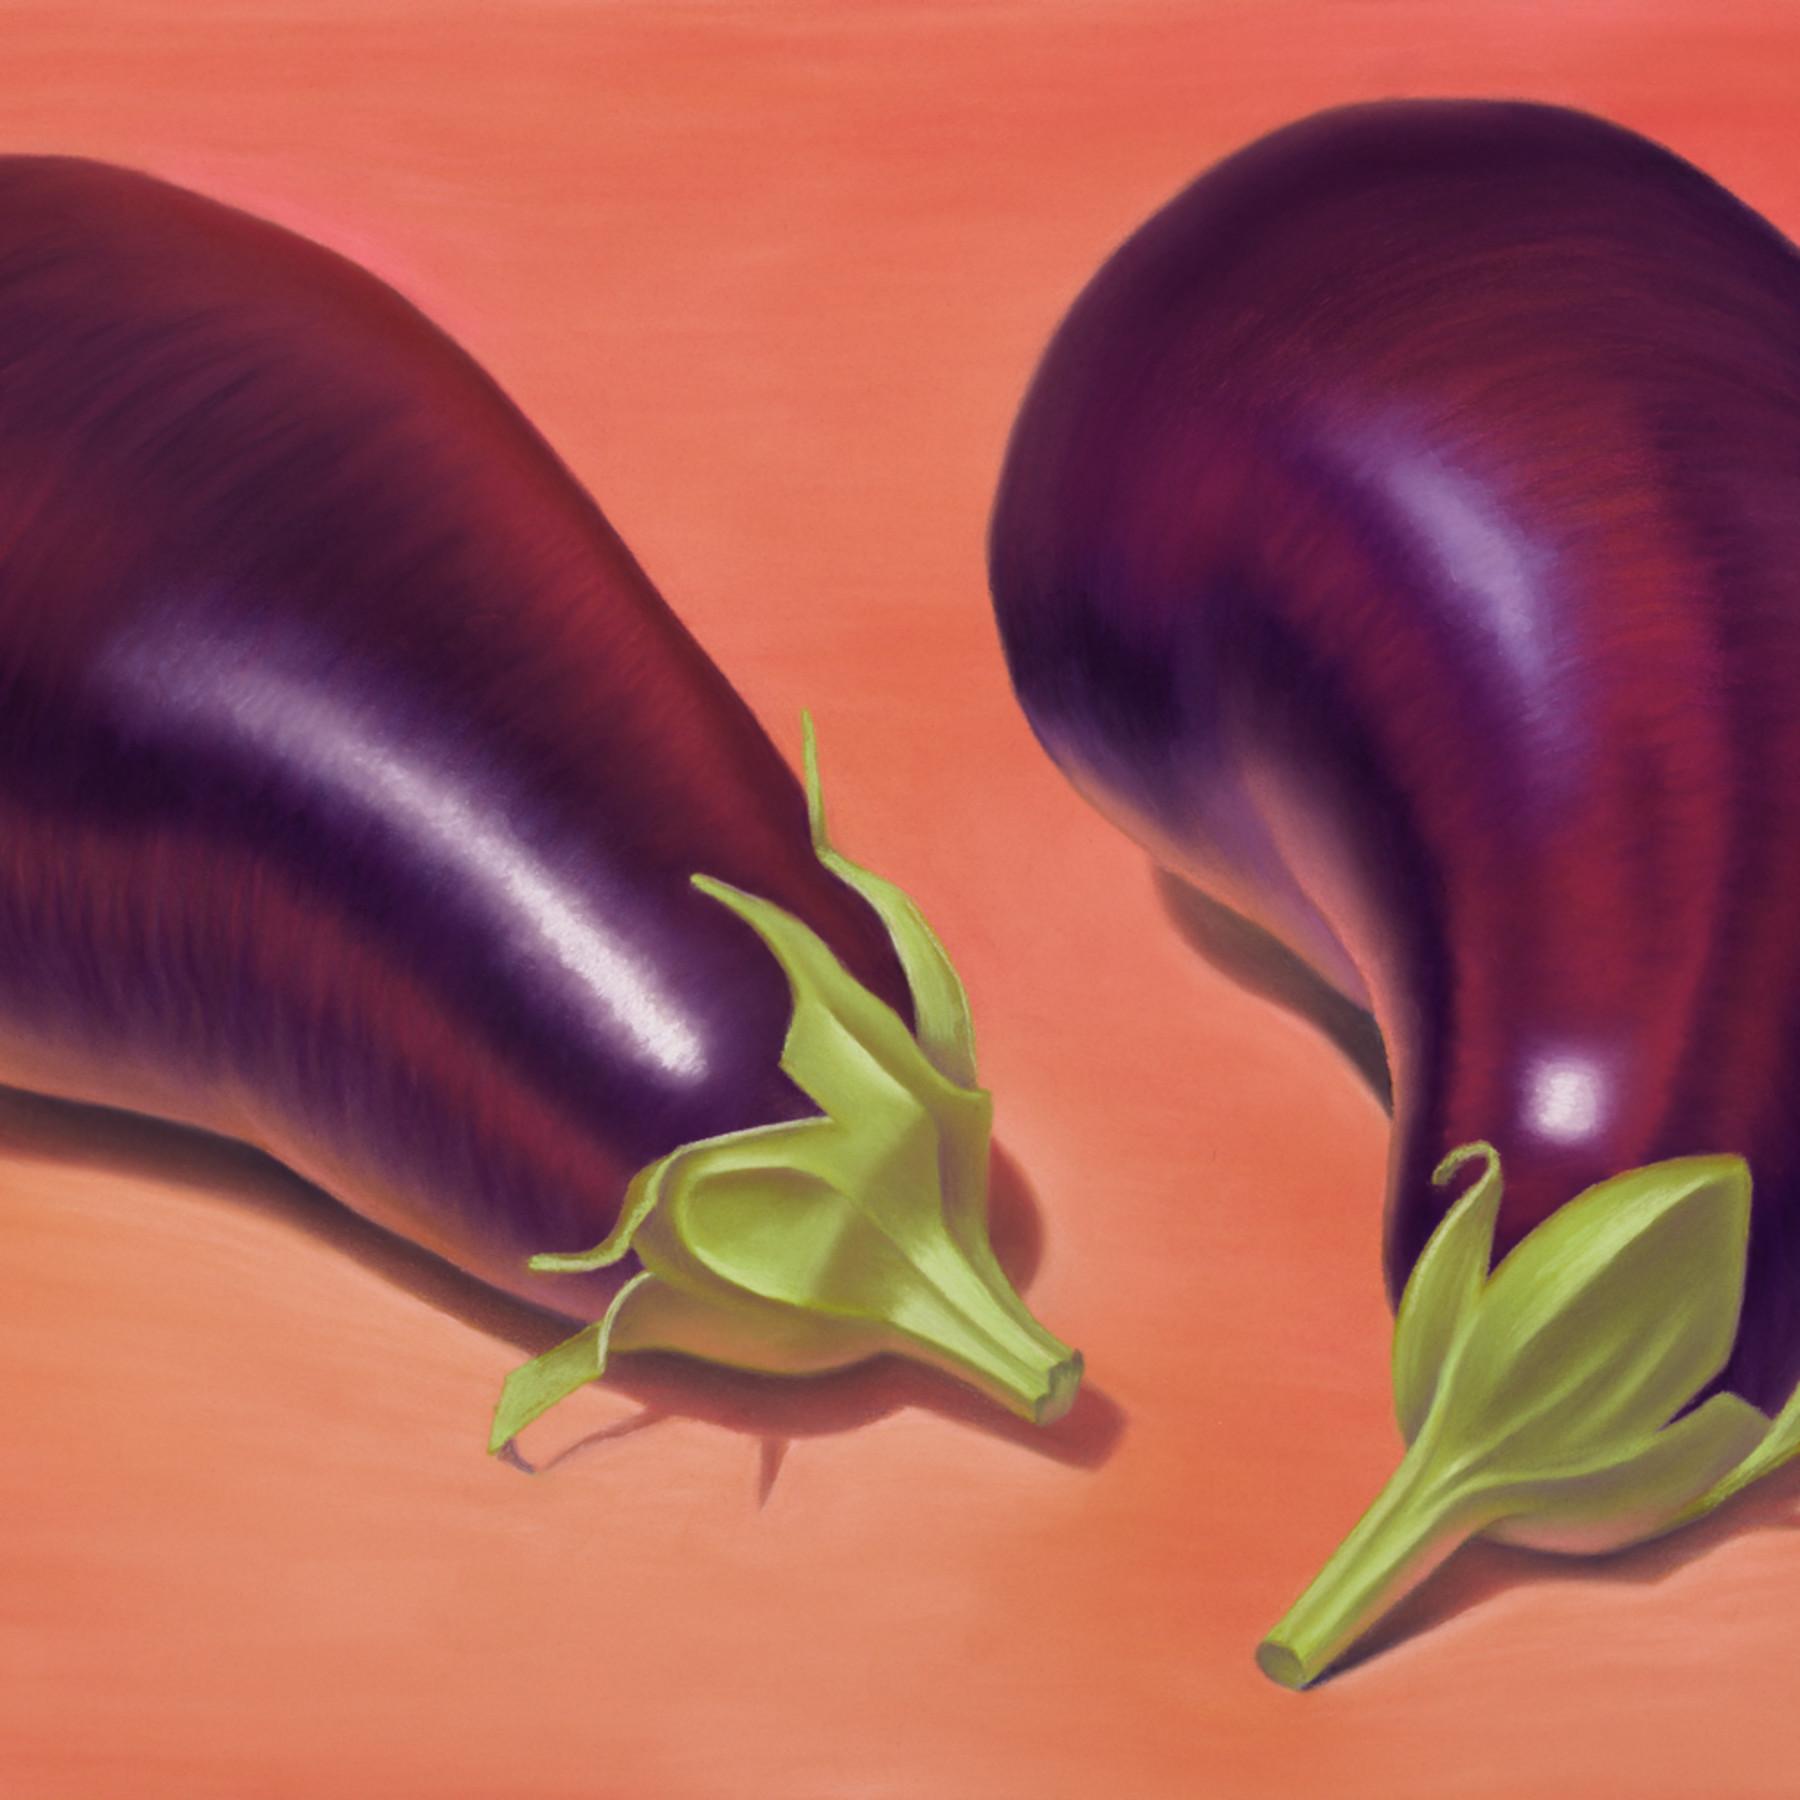 Eggplant bjfspd